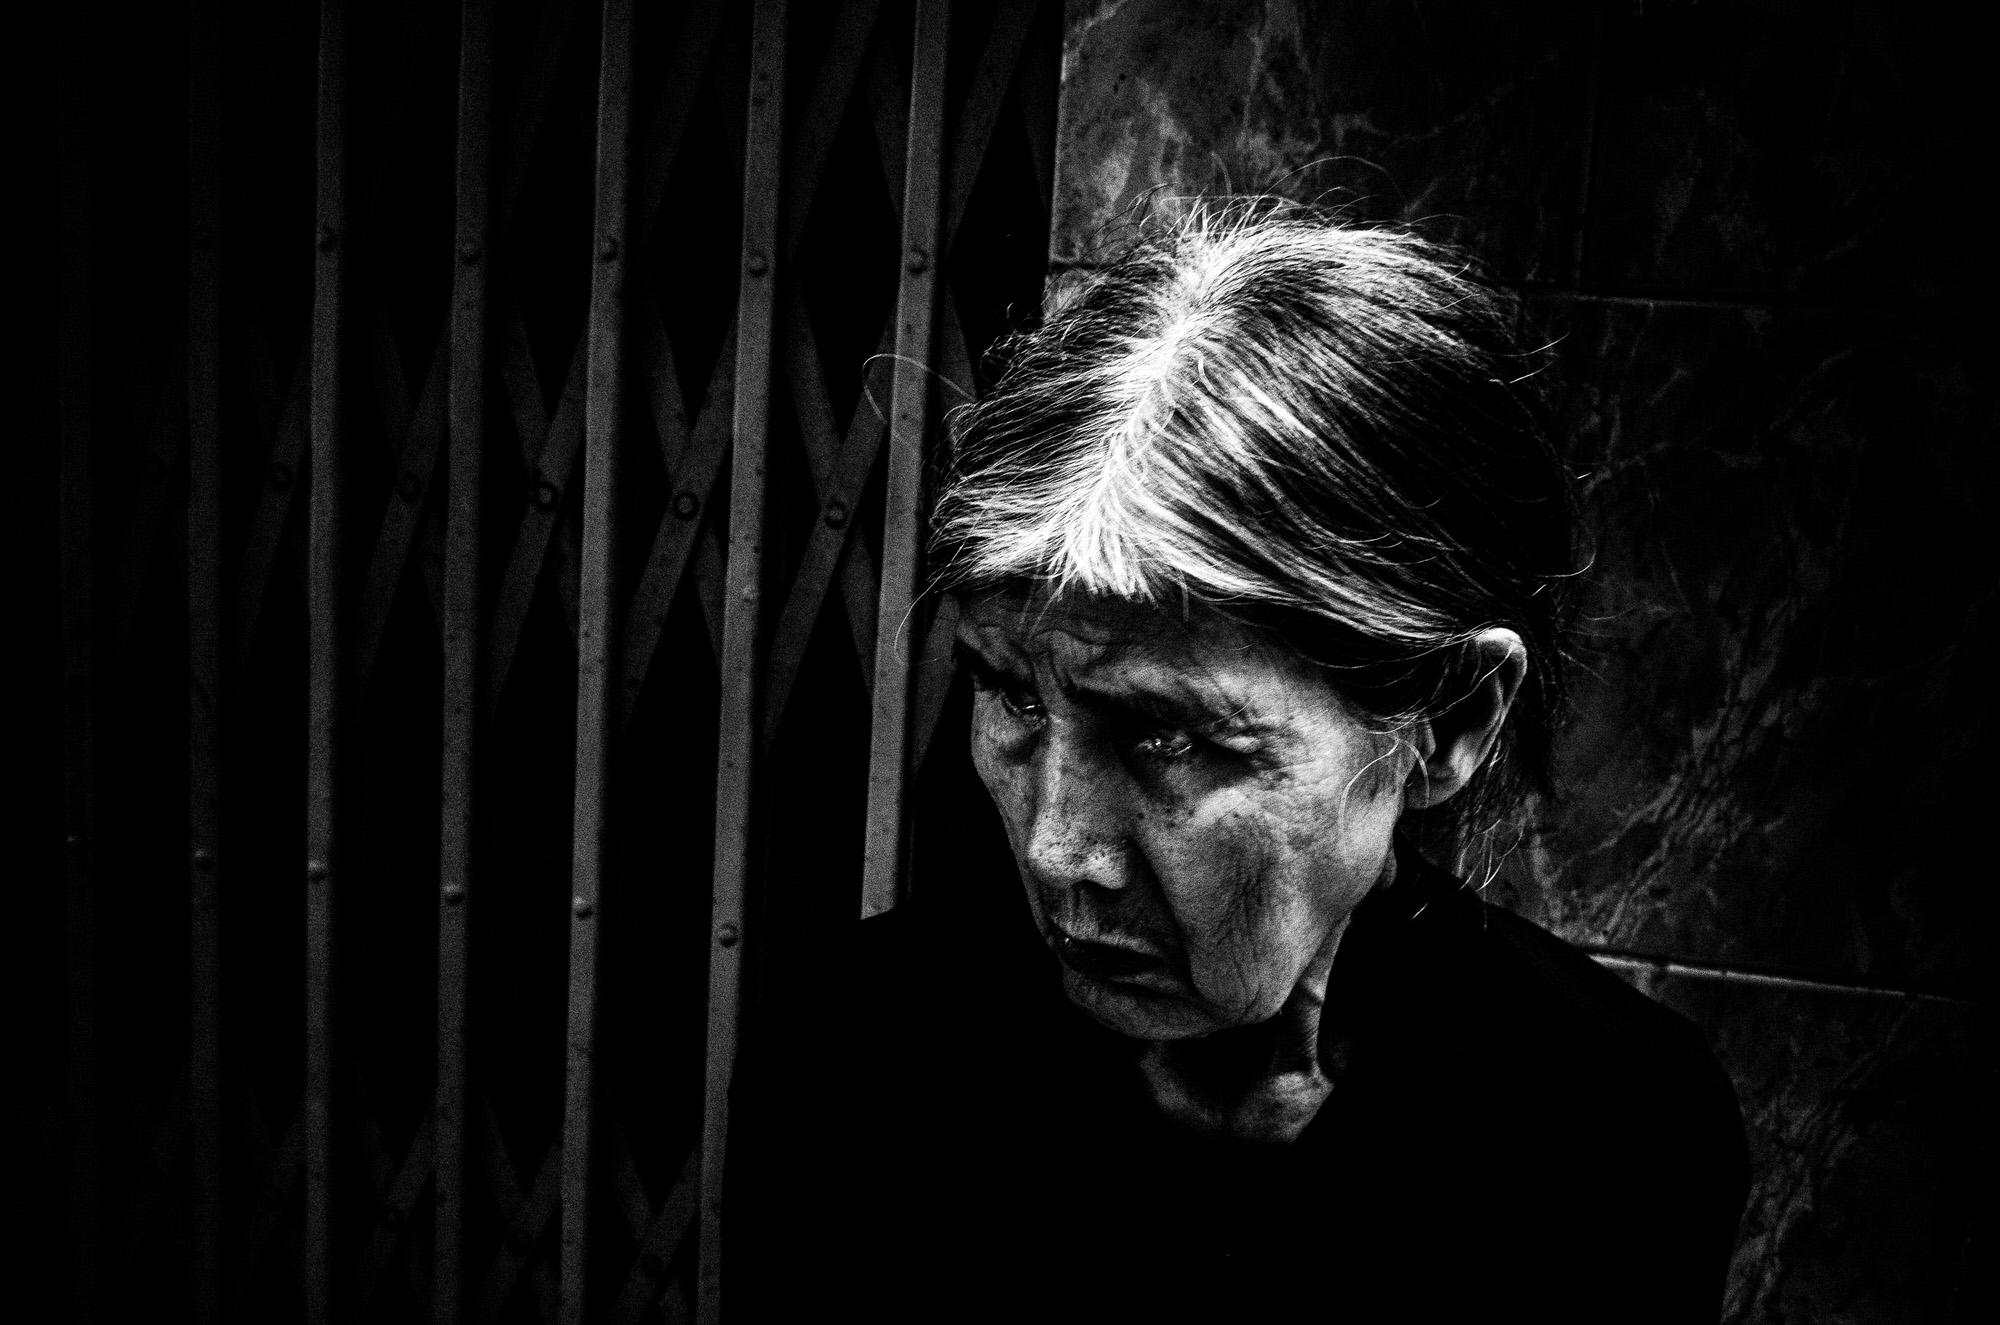 eric kim photography black and white - eric kim street photography hanoi - old woman